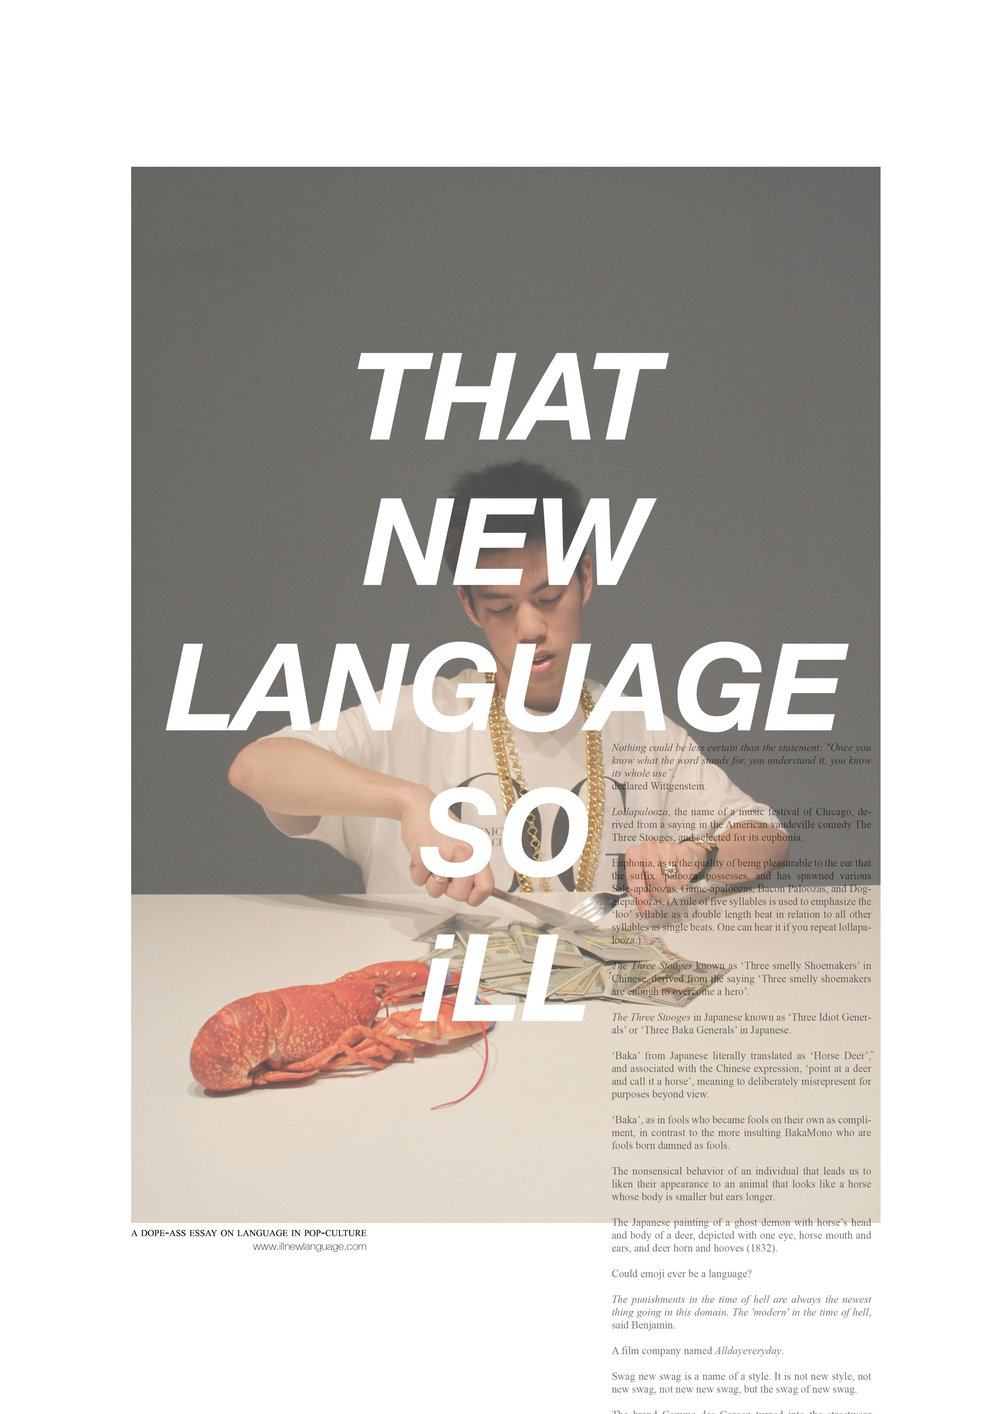 New Language So iLL